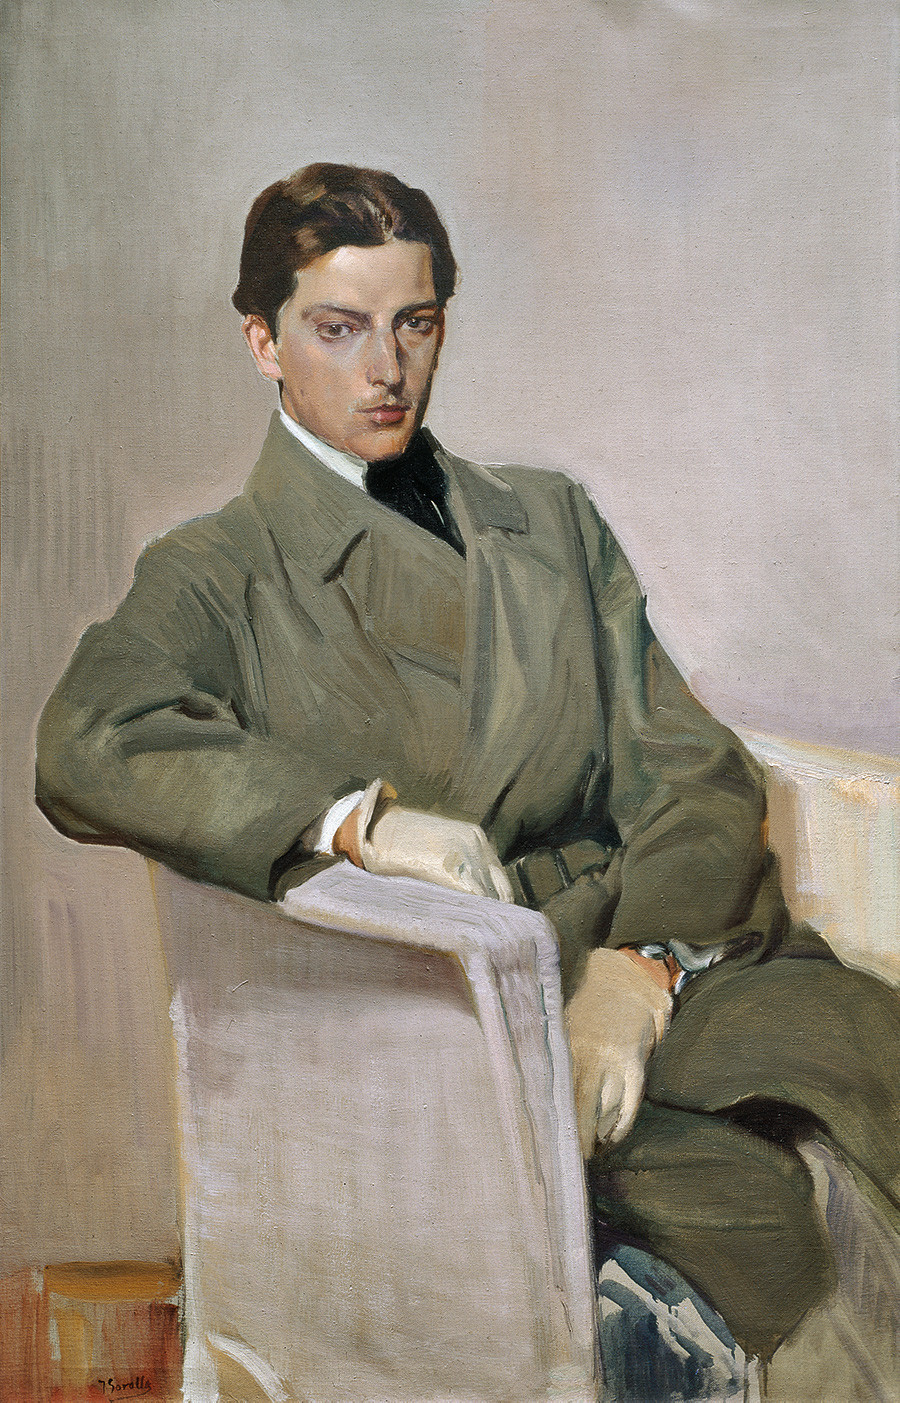 Self portrait by Joaquín Sorolla